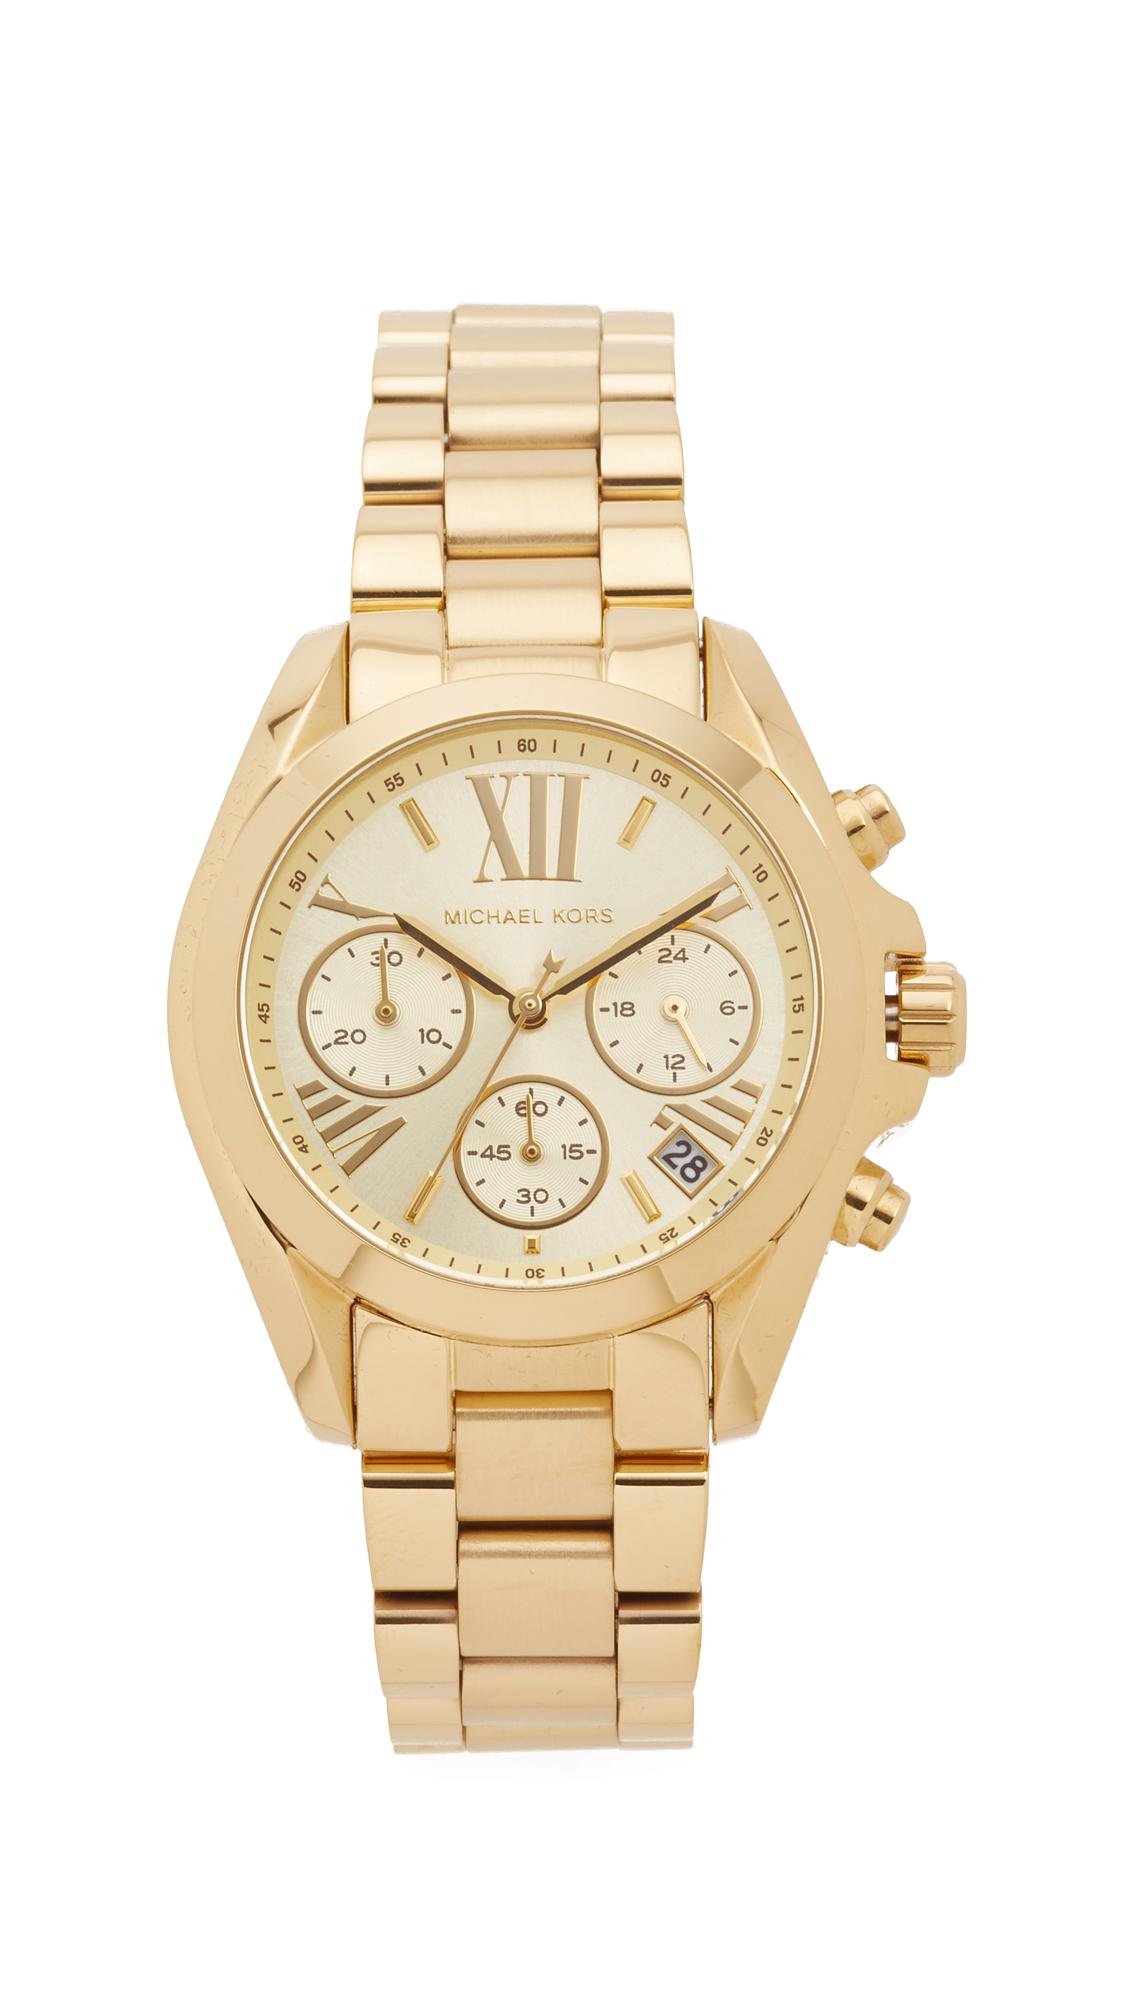 Michael Kors Bradshaw Watch - Gold